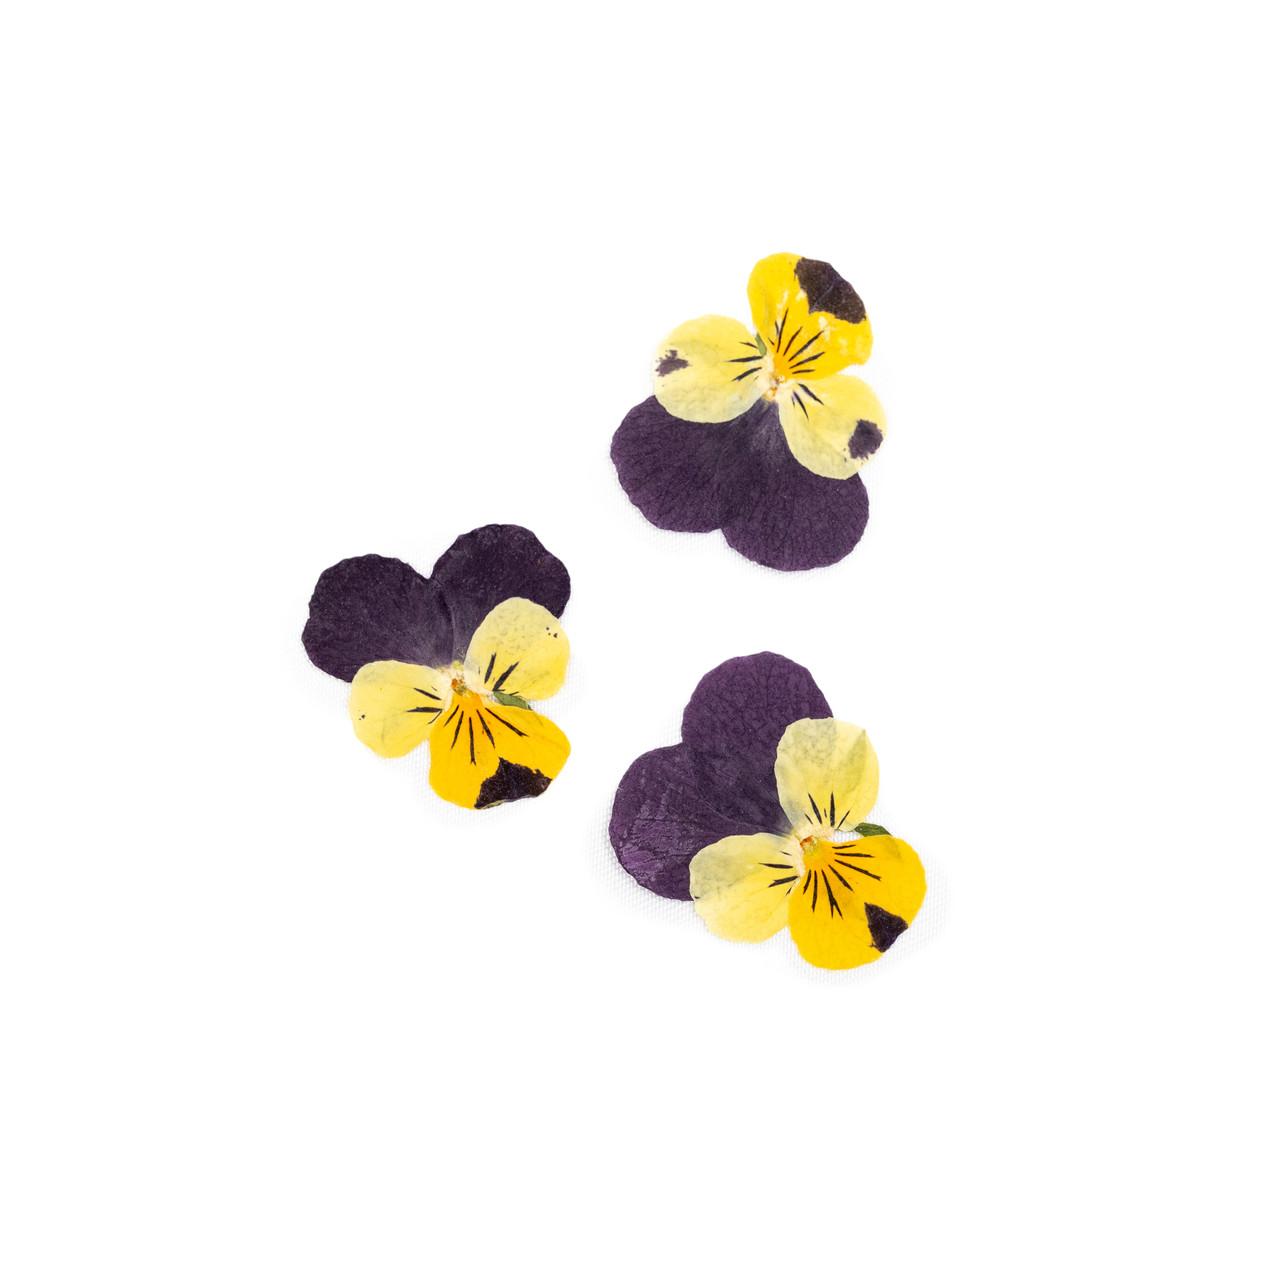 Pressed Botanical - Pansy Flowers